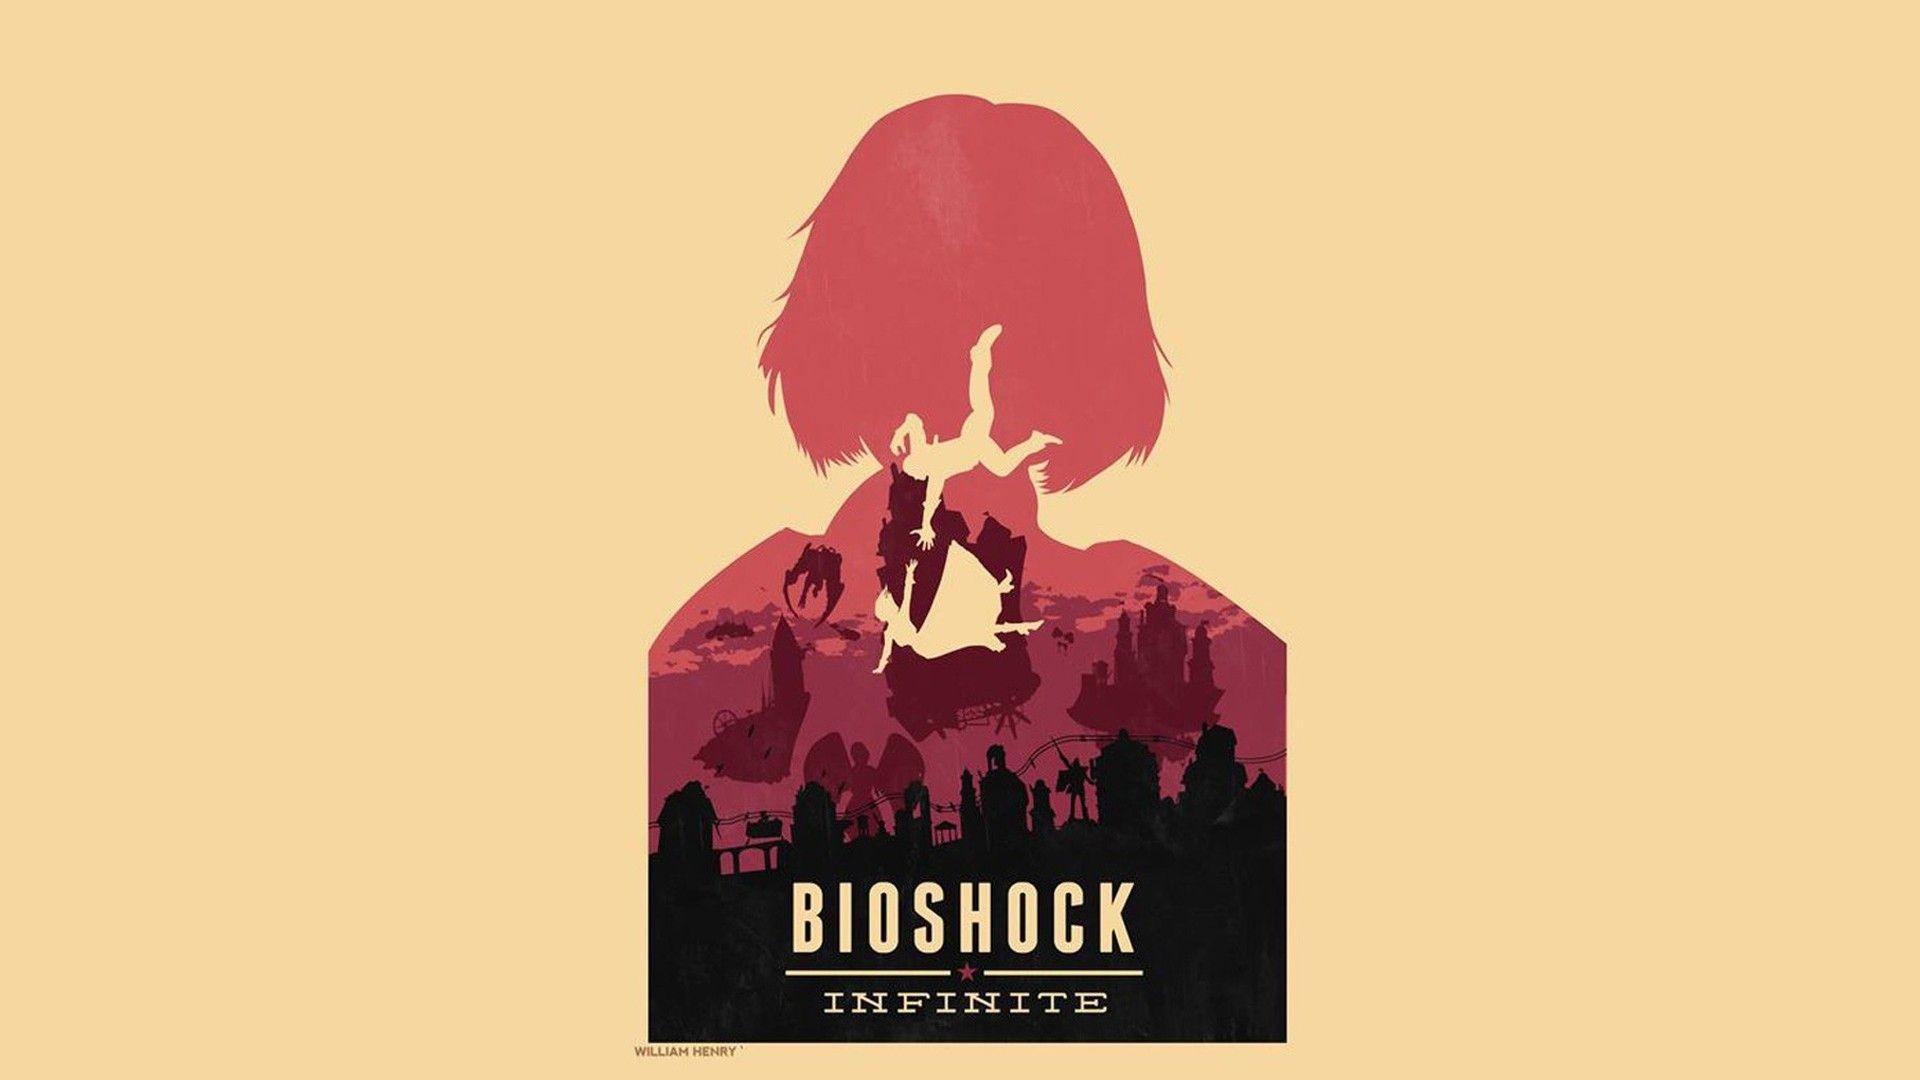 BiOShock Rapture Wallpaper 84 images